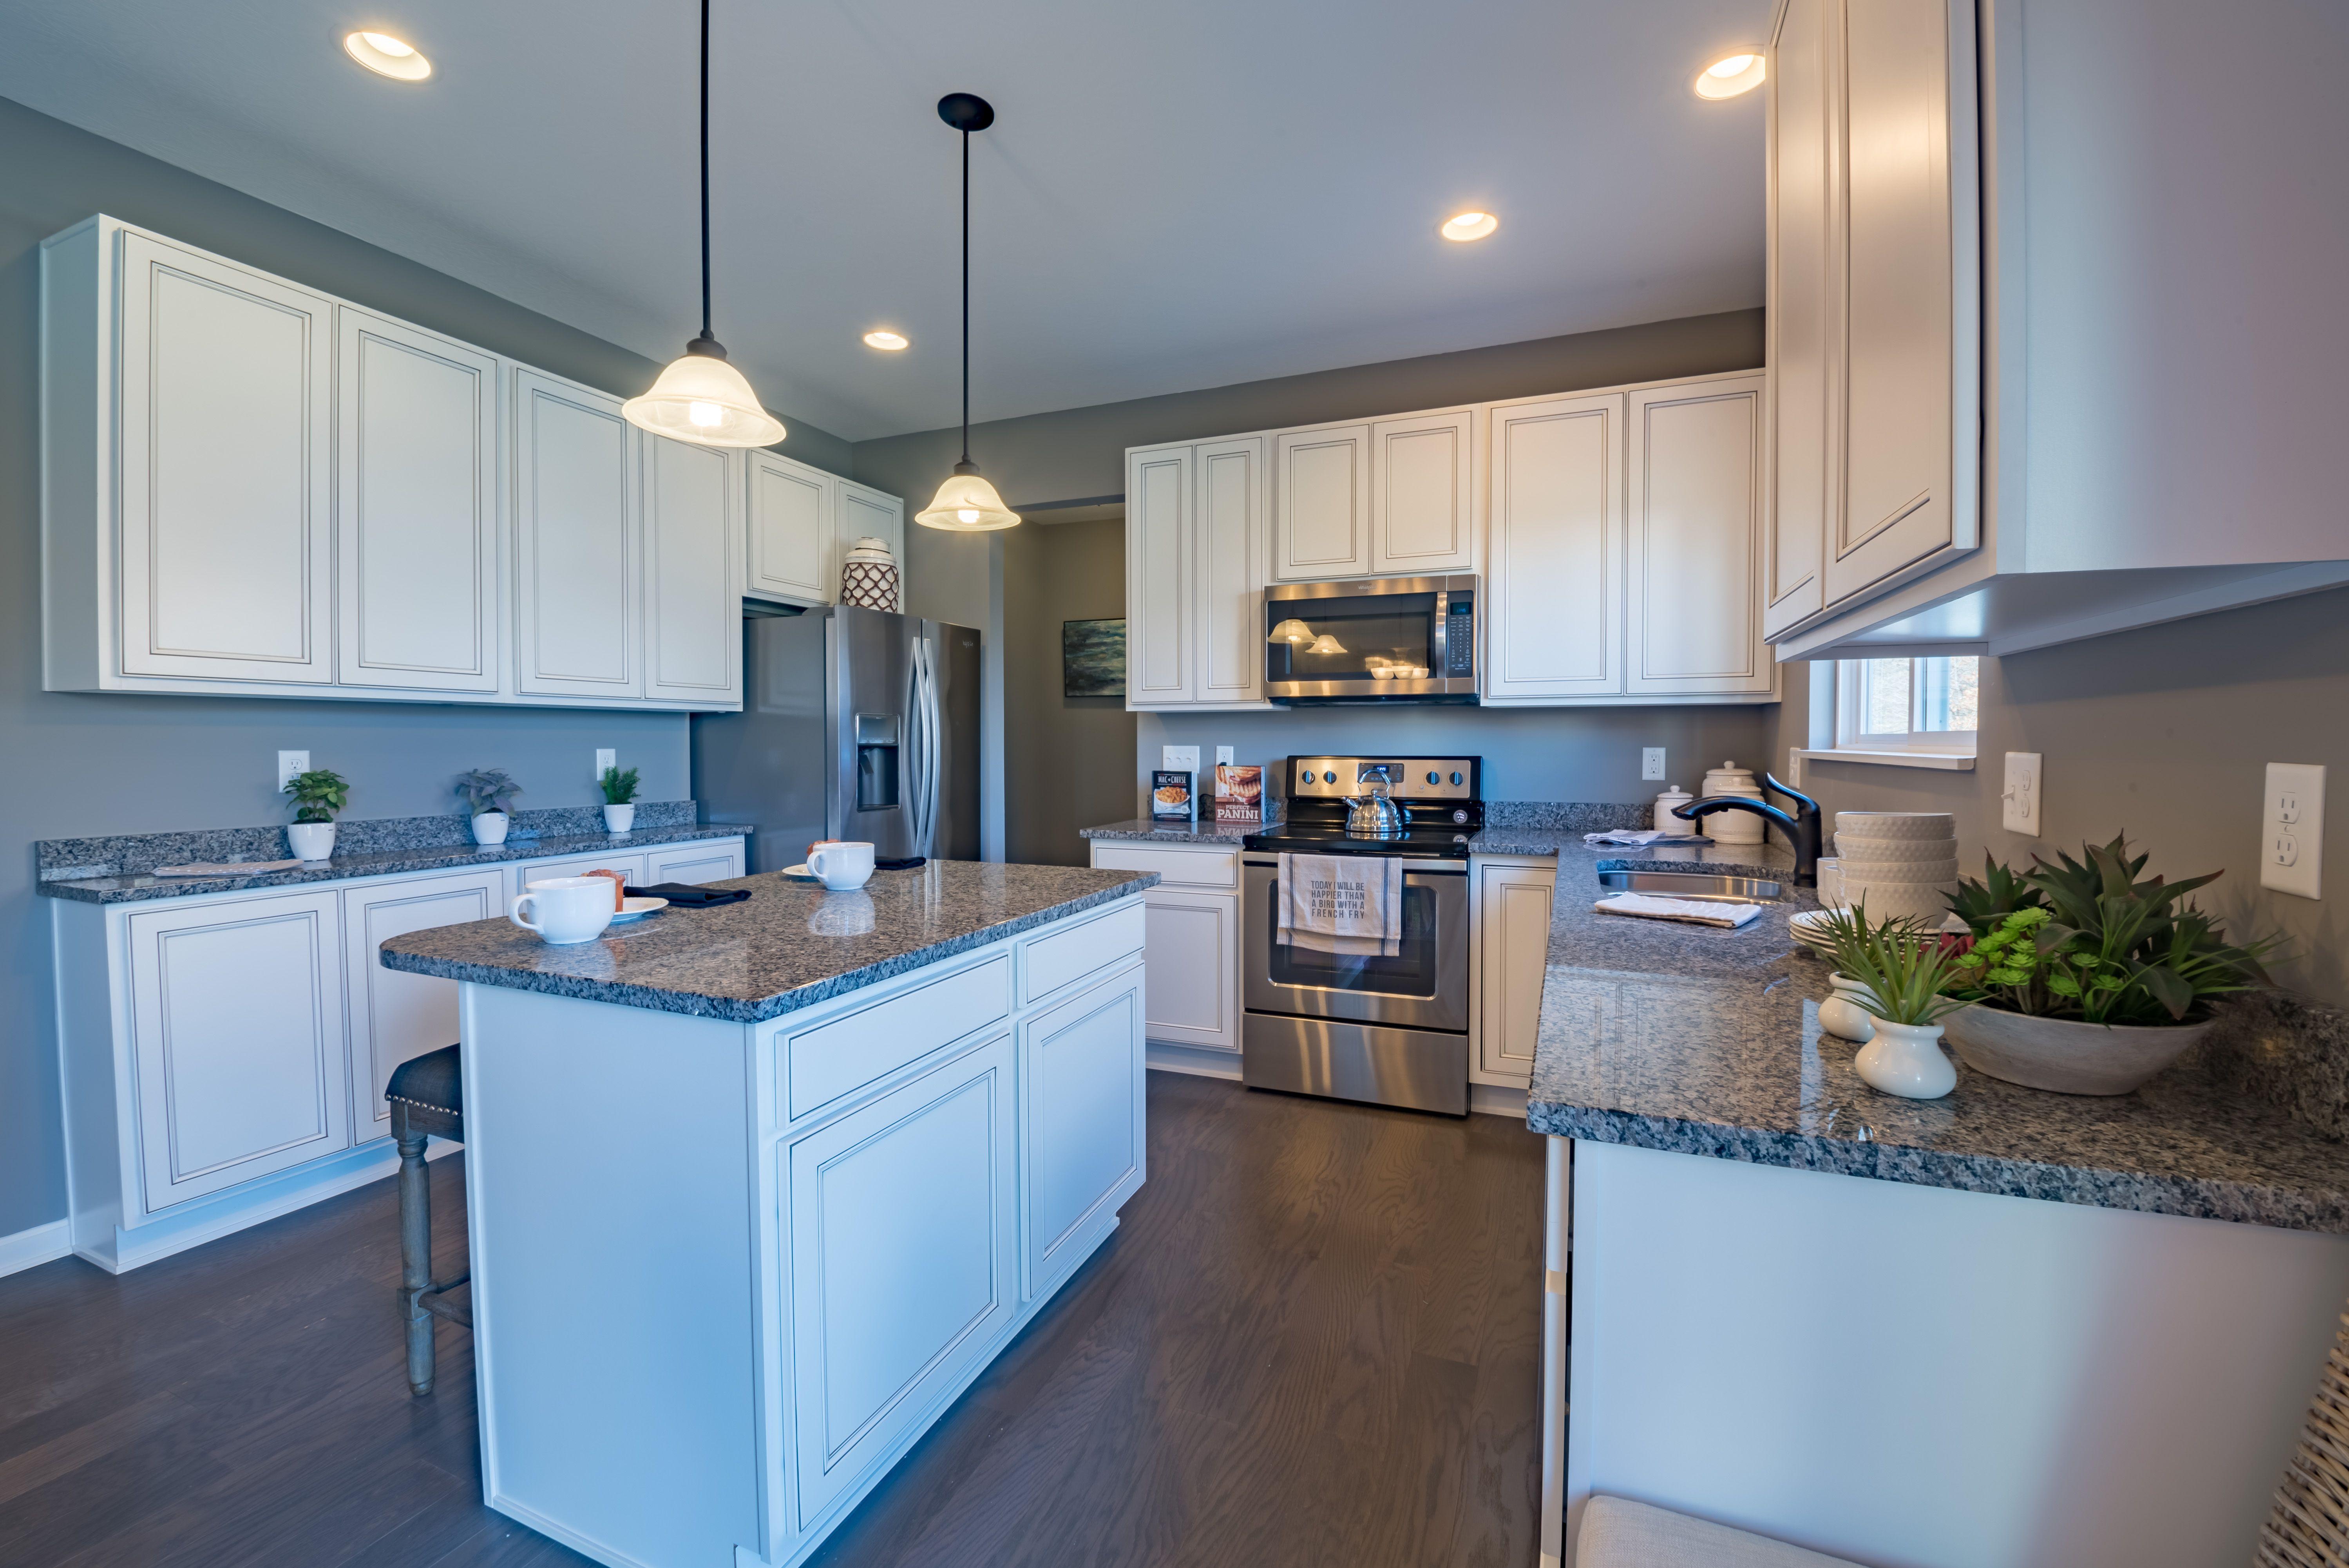 Kitchen featured in the Denali By Fischer Homes  in Louisville, KY